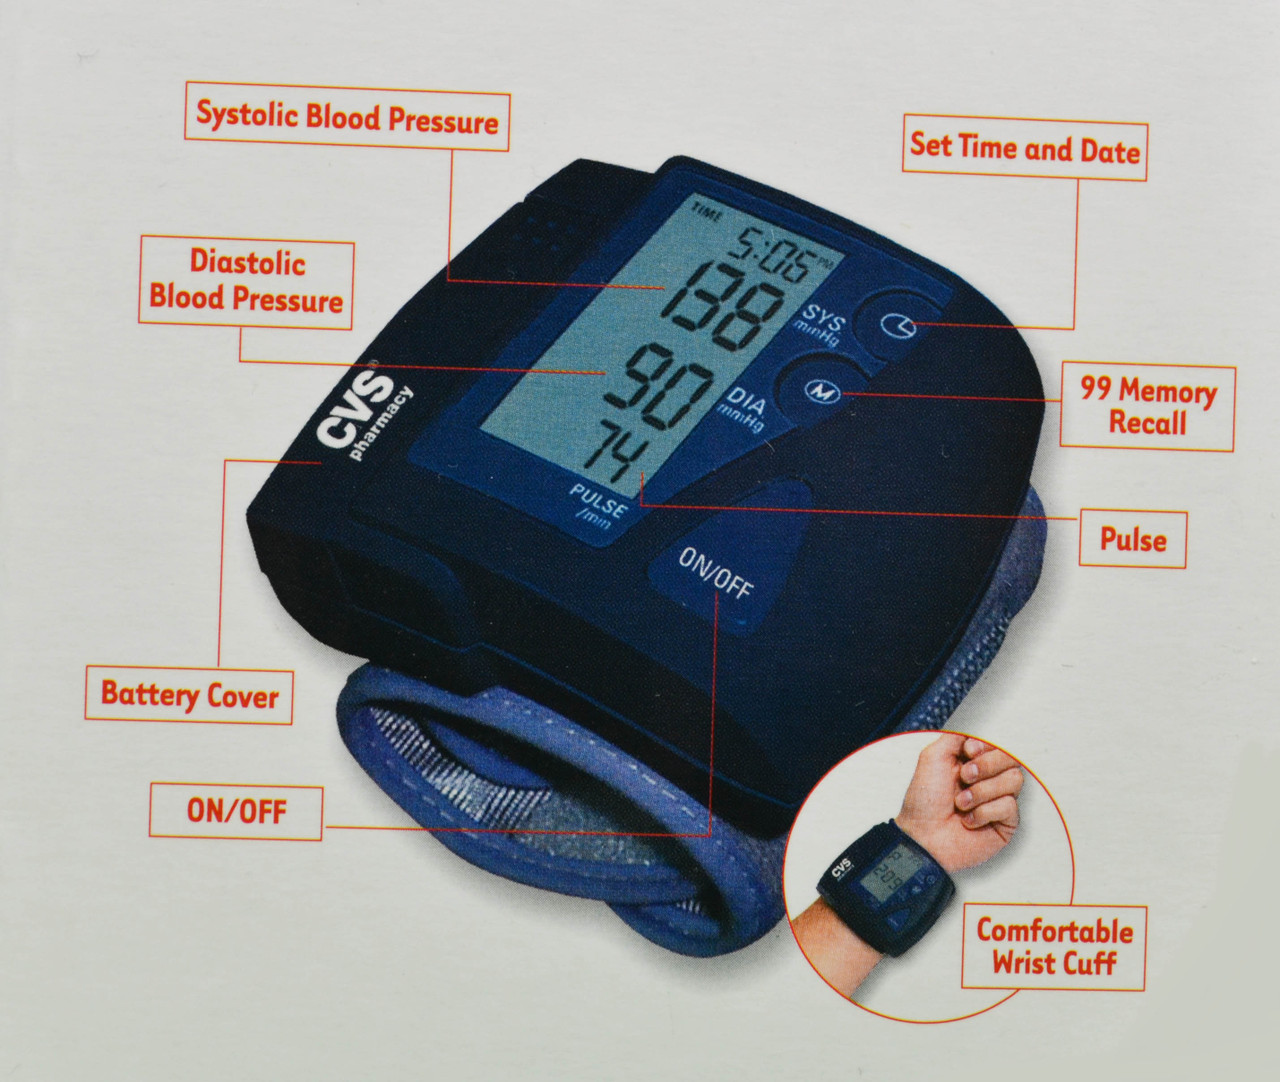 CVS Pharmacy Blood Pressure Monitor Digital Wrist Cuff Pulse